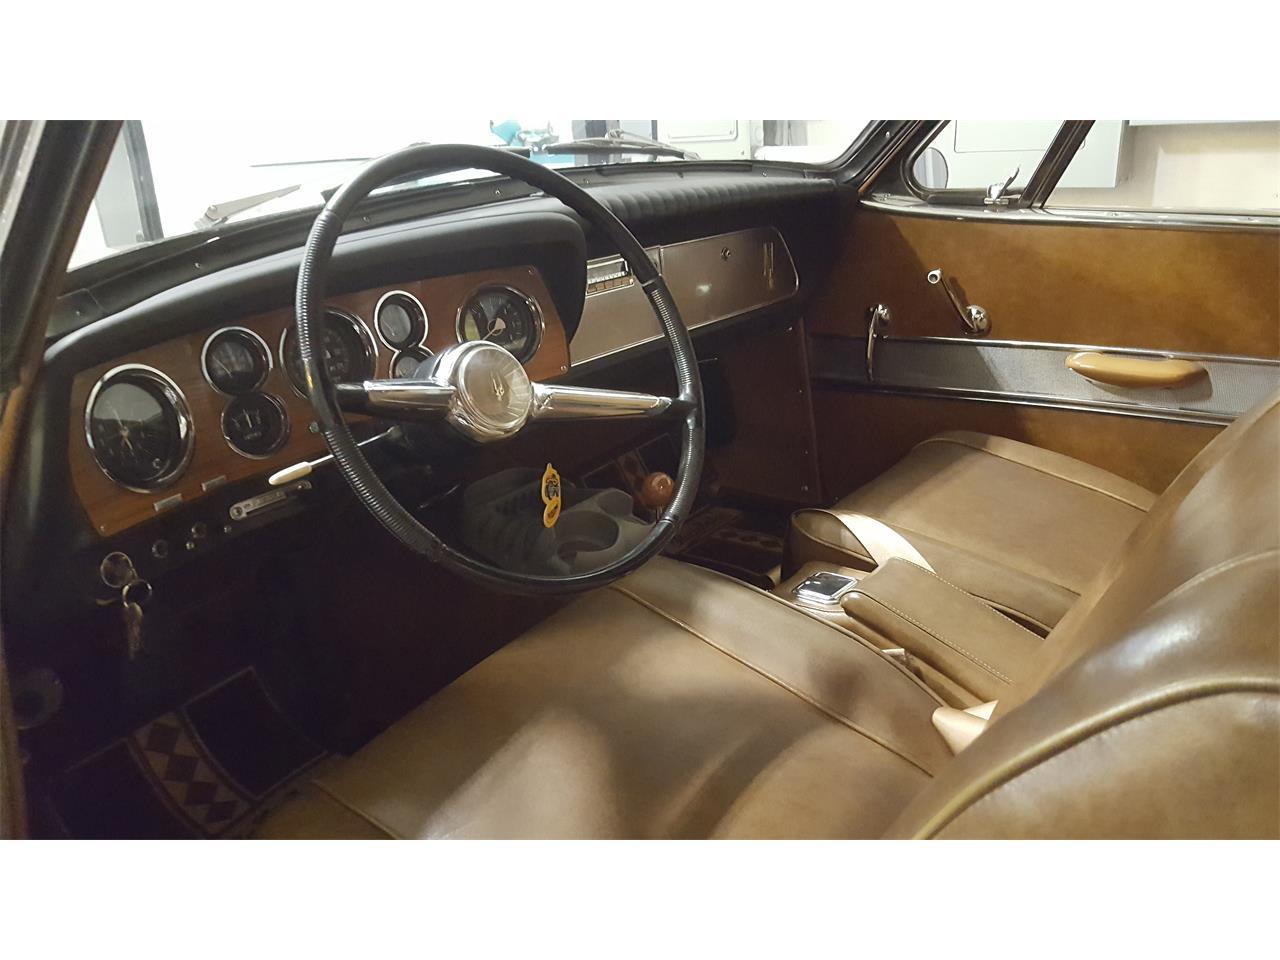 Large Picture of '62 Gran Turismo located in Michigan - $26,000.00 - MESV